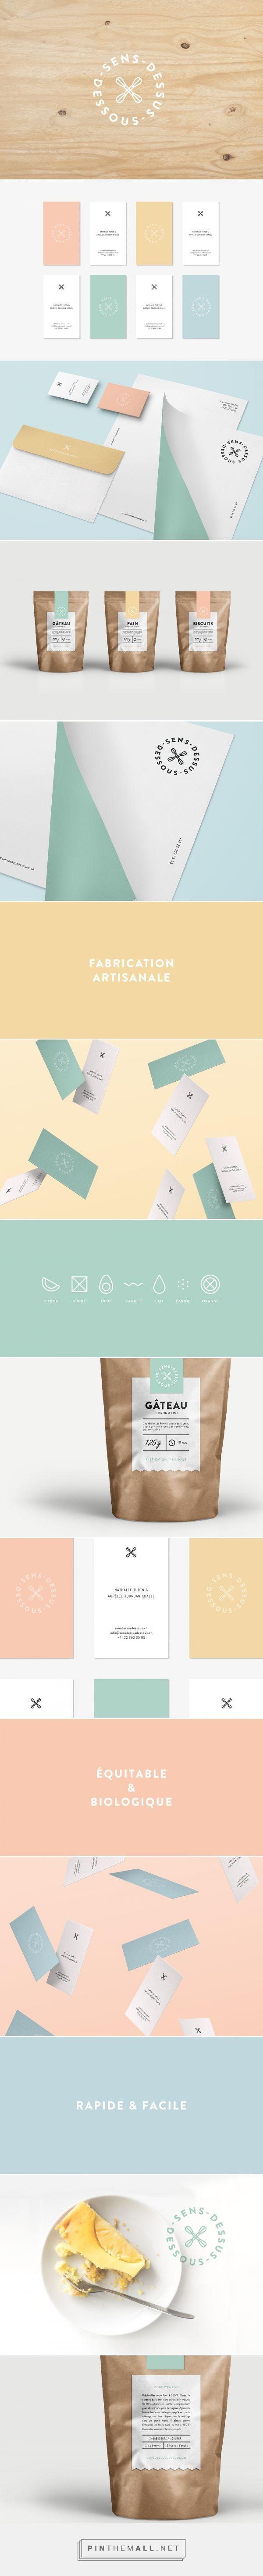 Sens-dessus-dessous on Behance | Fivestar Branding – Design and Branding Agency & Inspiration Gallery